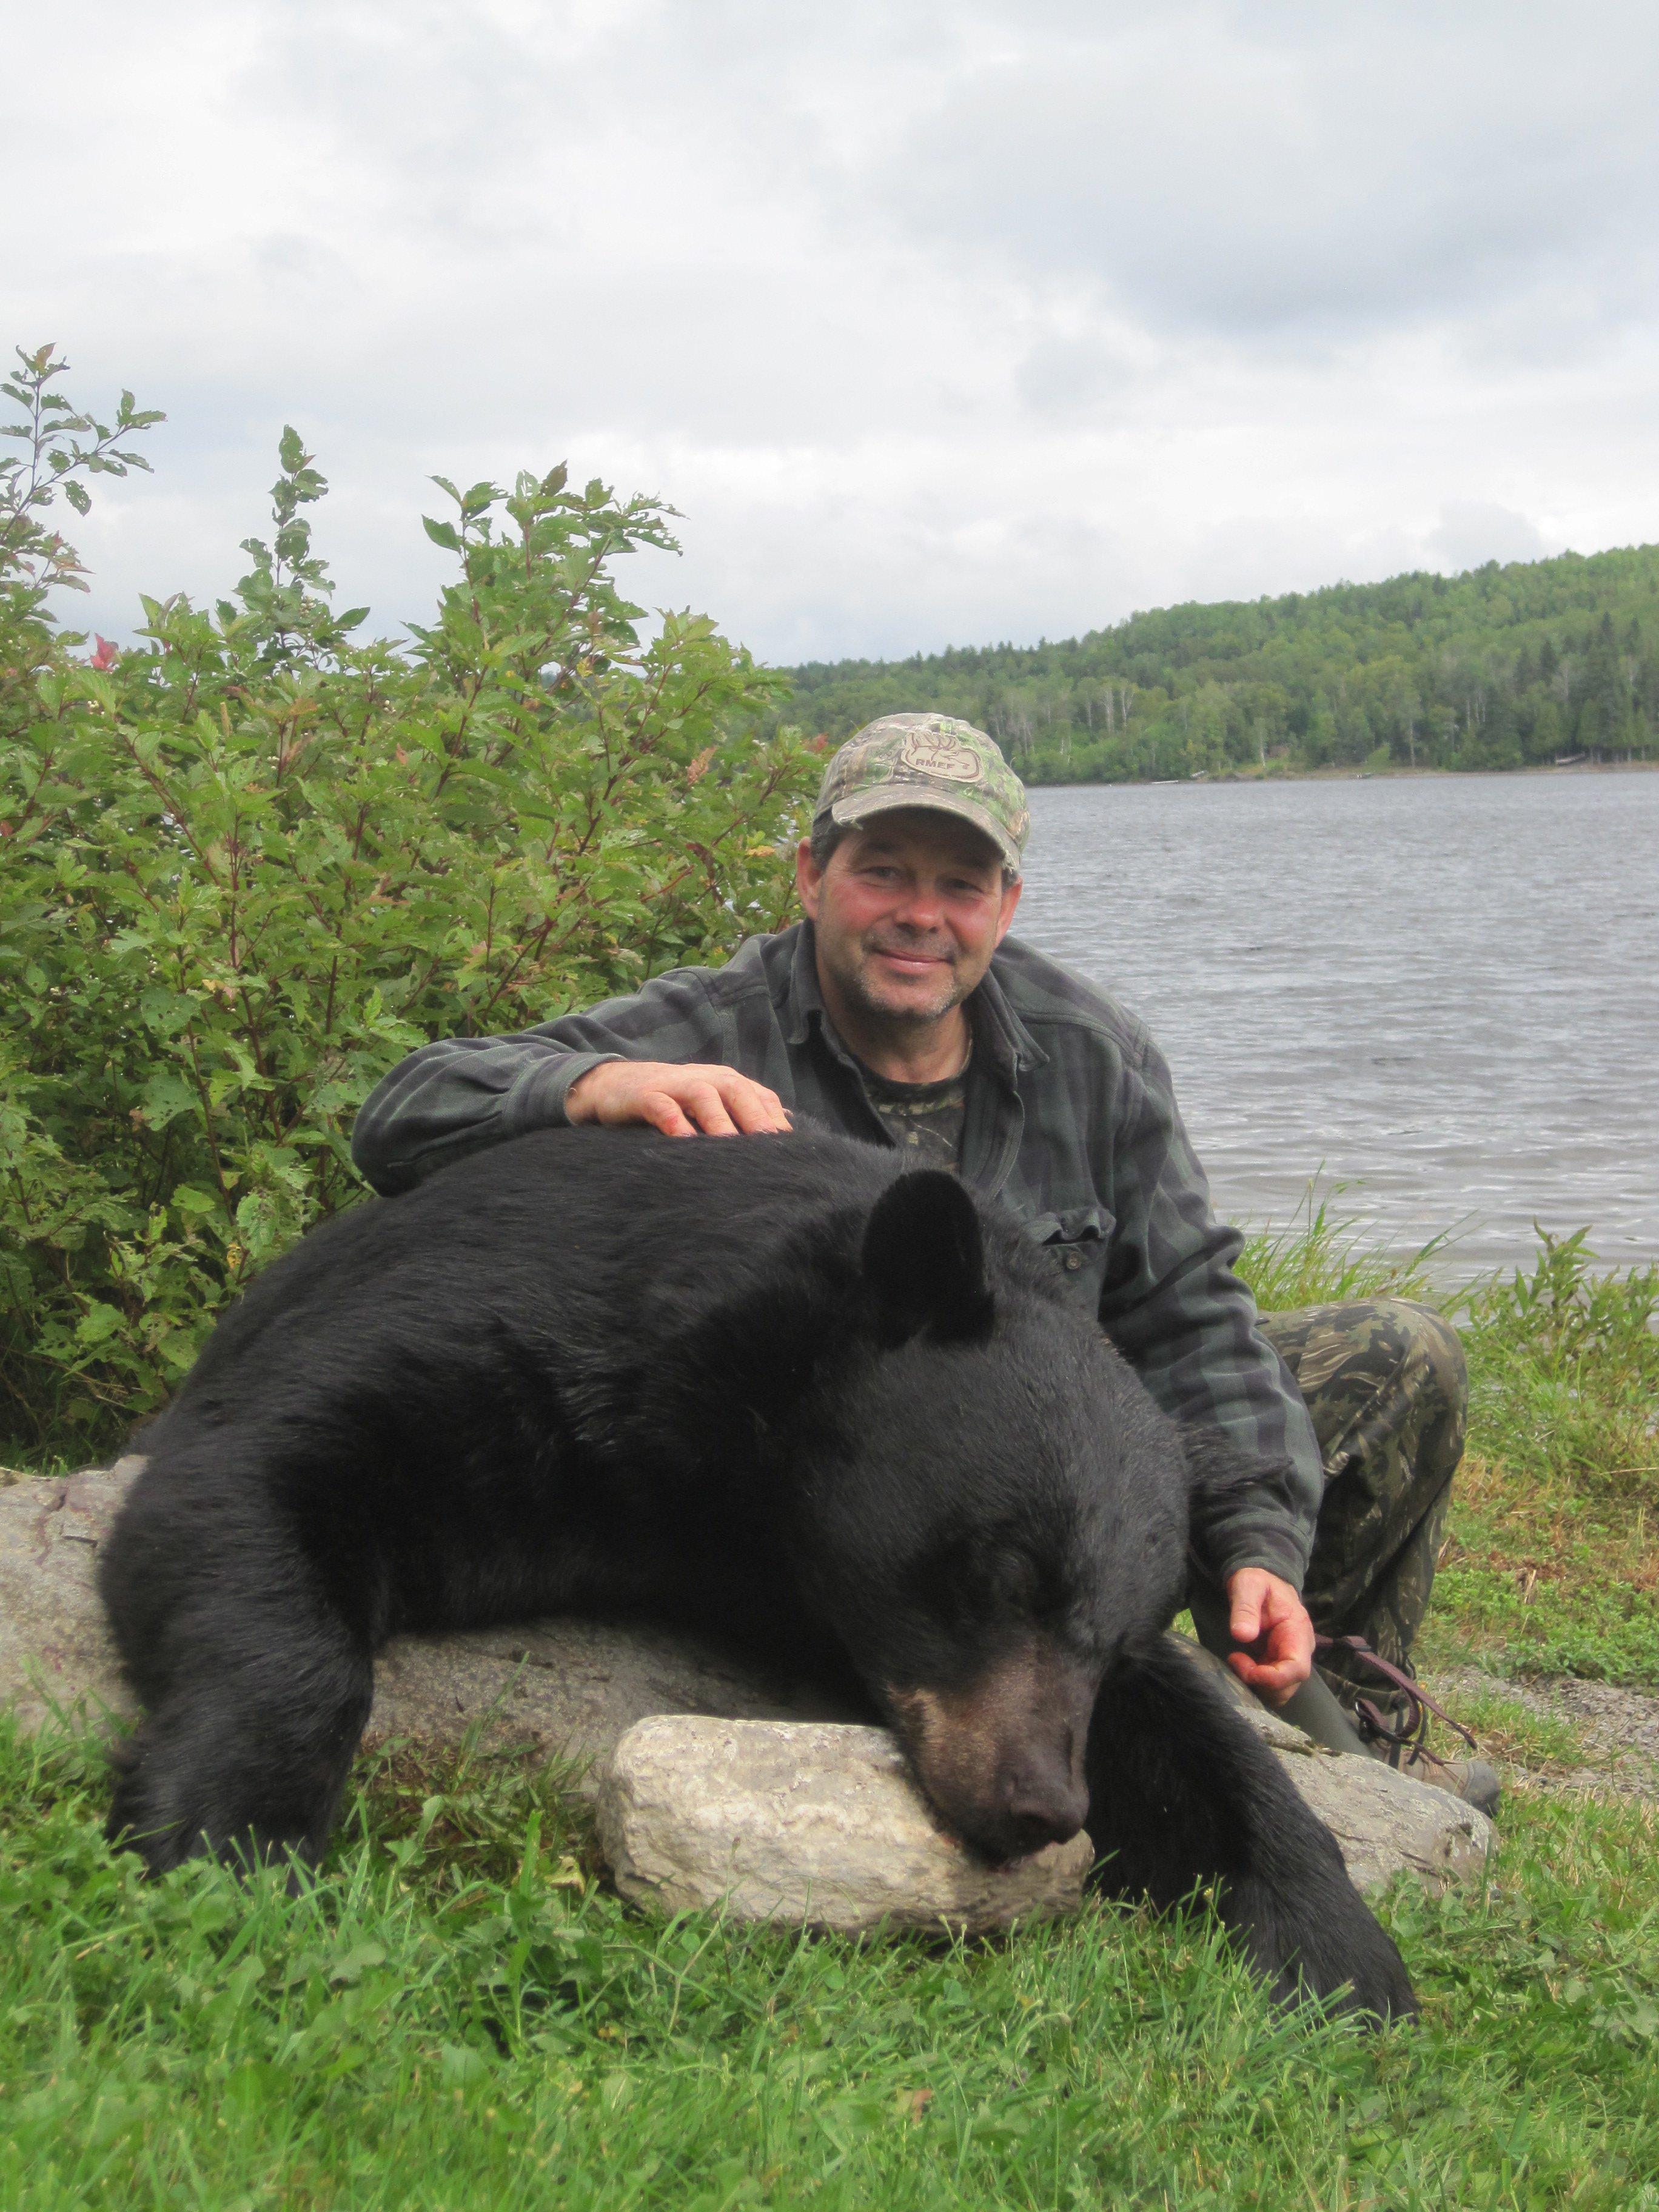 Duane's 403 lb. black bear.